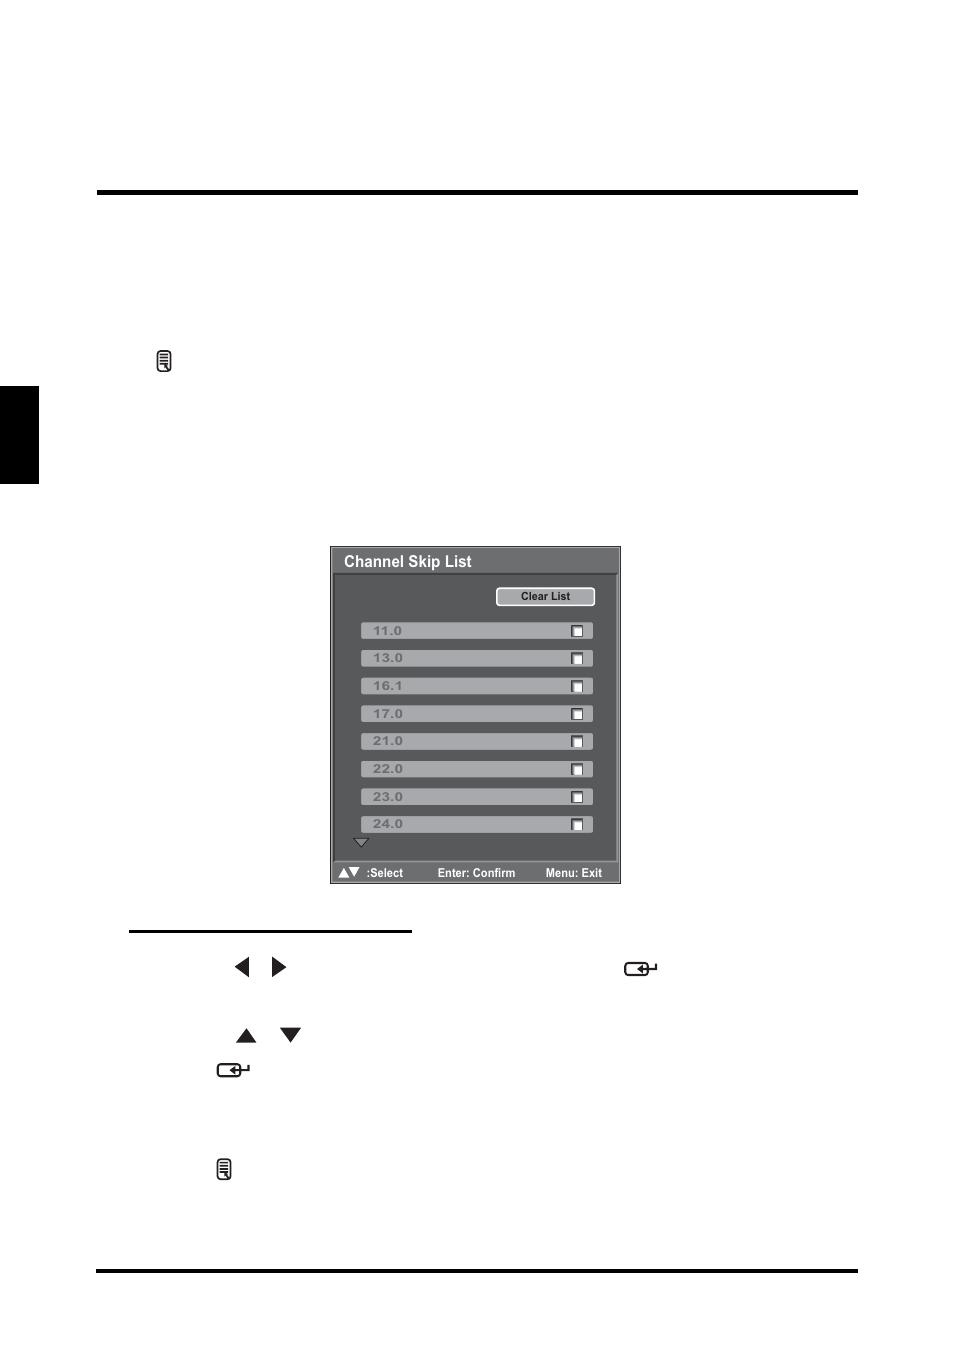 tv program english skip list westinghouse ld 4655vx user manual rh manualsdir com